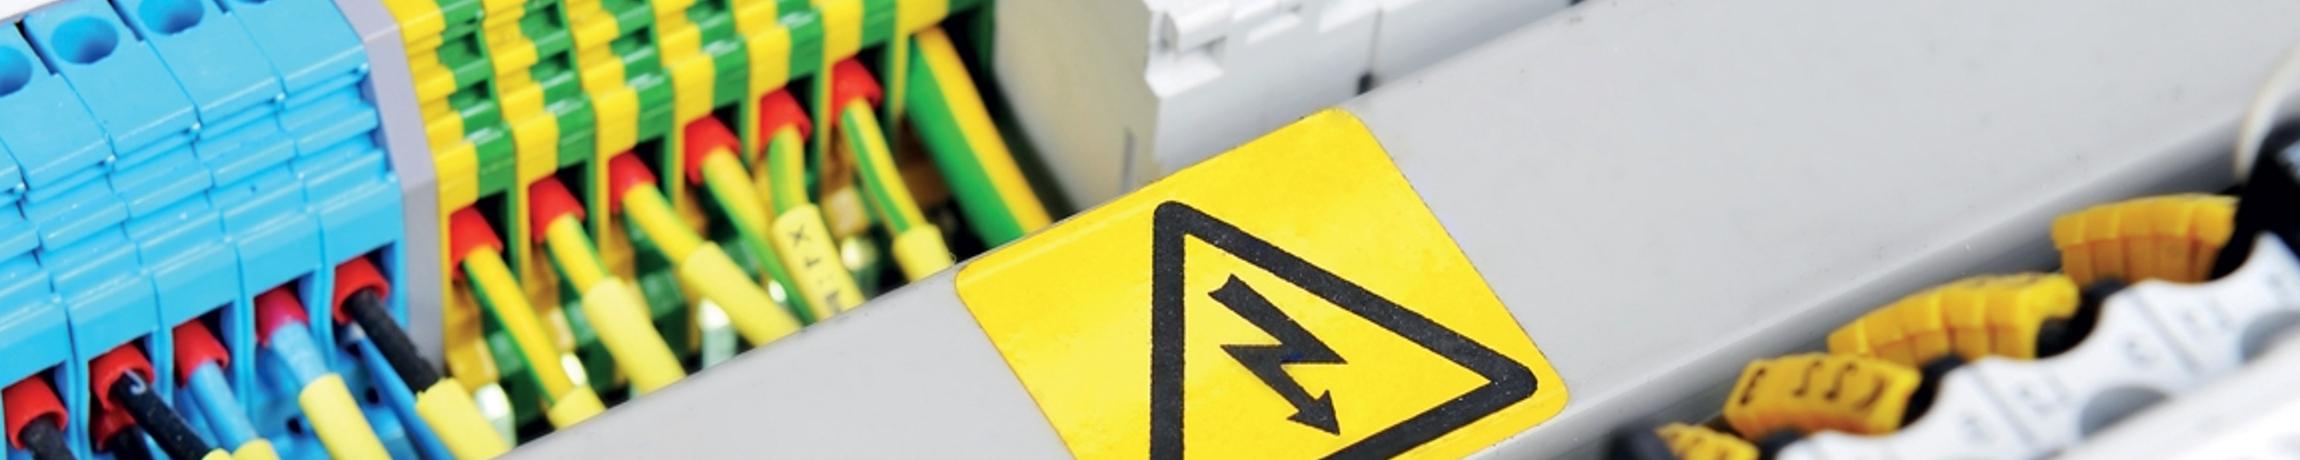 servizio-impianti-elettrici-sassari-sardegna